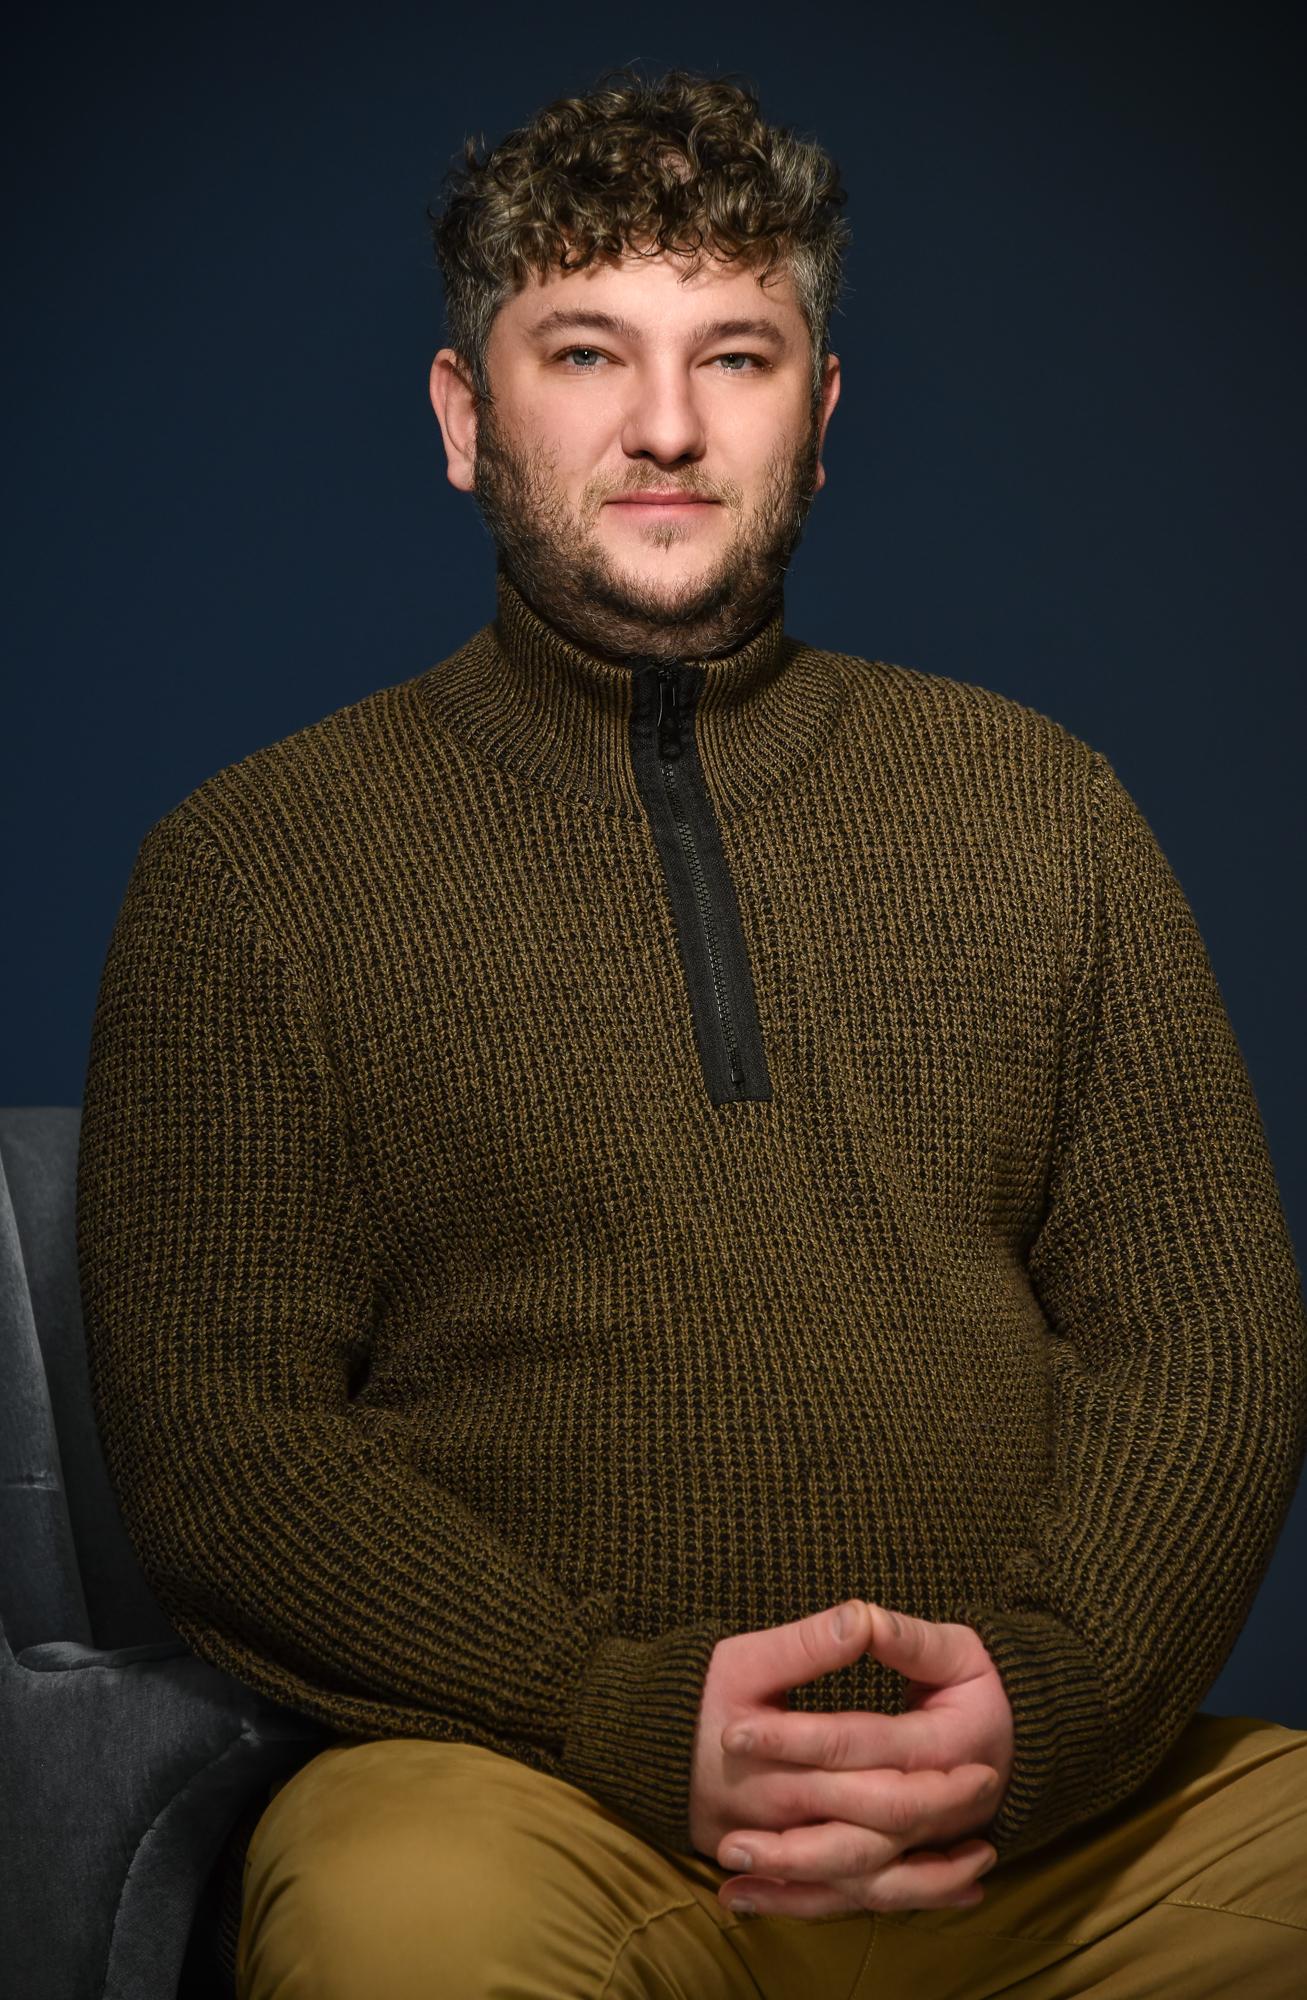 Pavel Katsiushyn